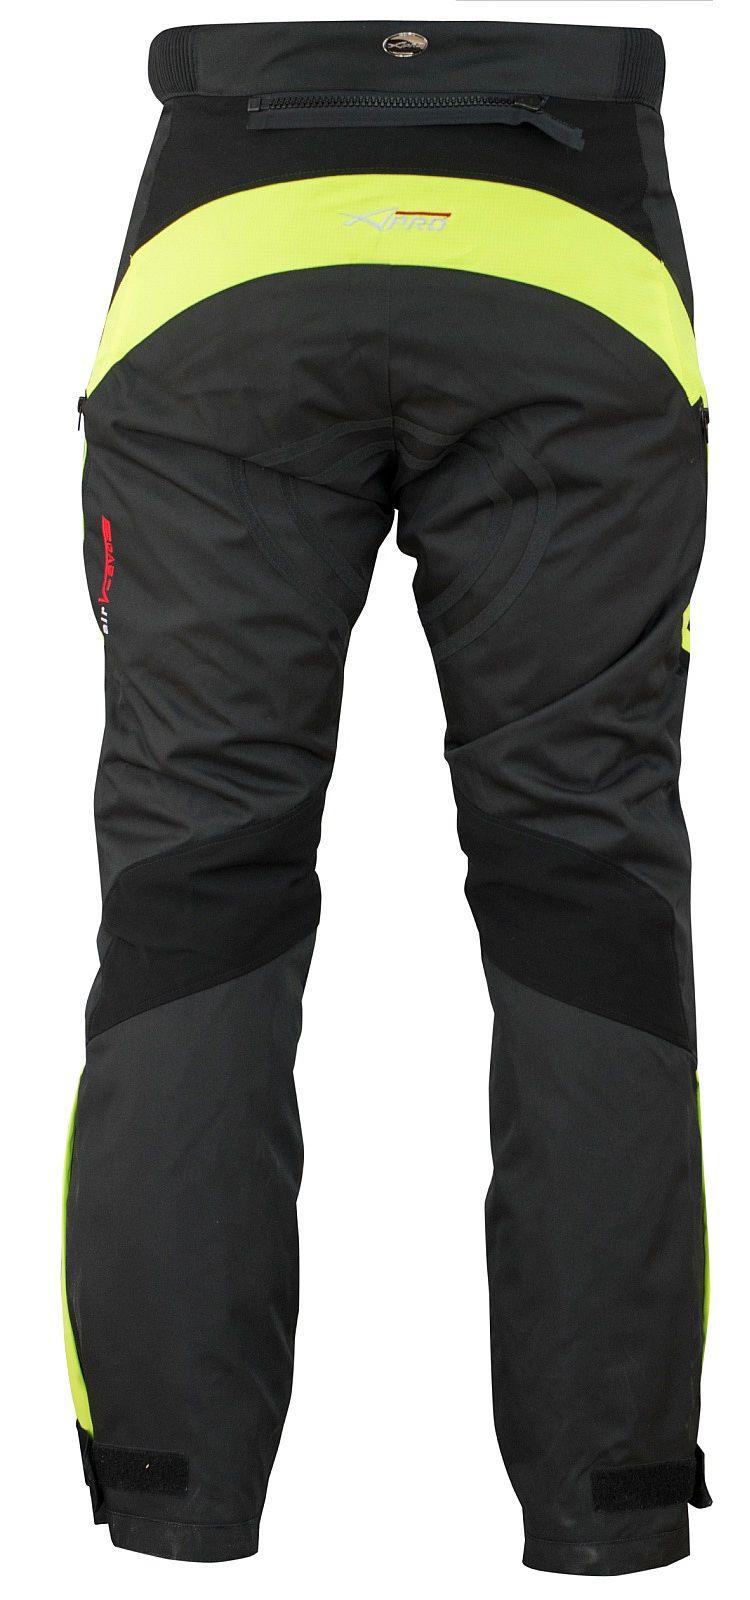 miniatuur 13 - Pantaloni Impermeabile Moto Imbottitura Termica Estraibile Traspirante Cordura